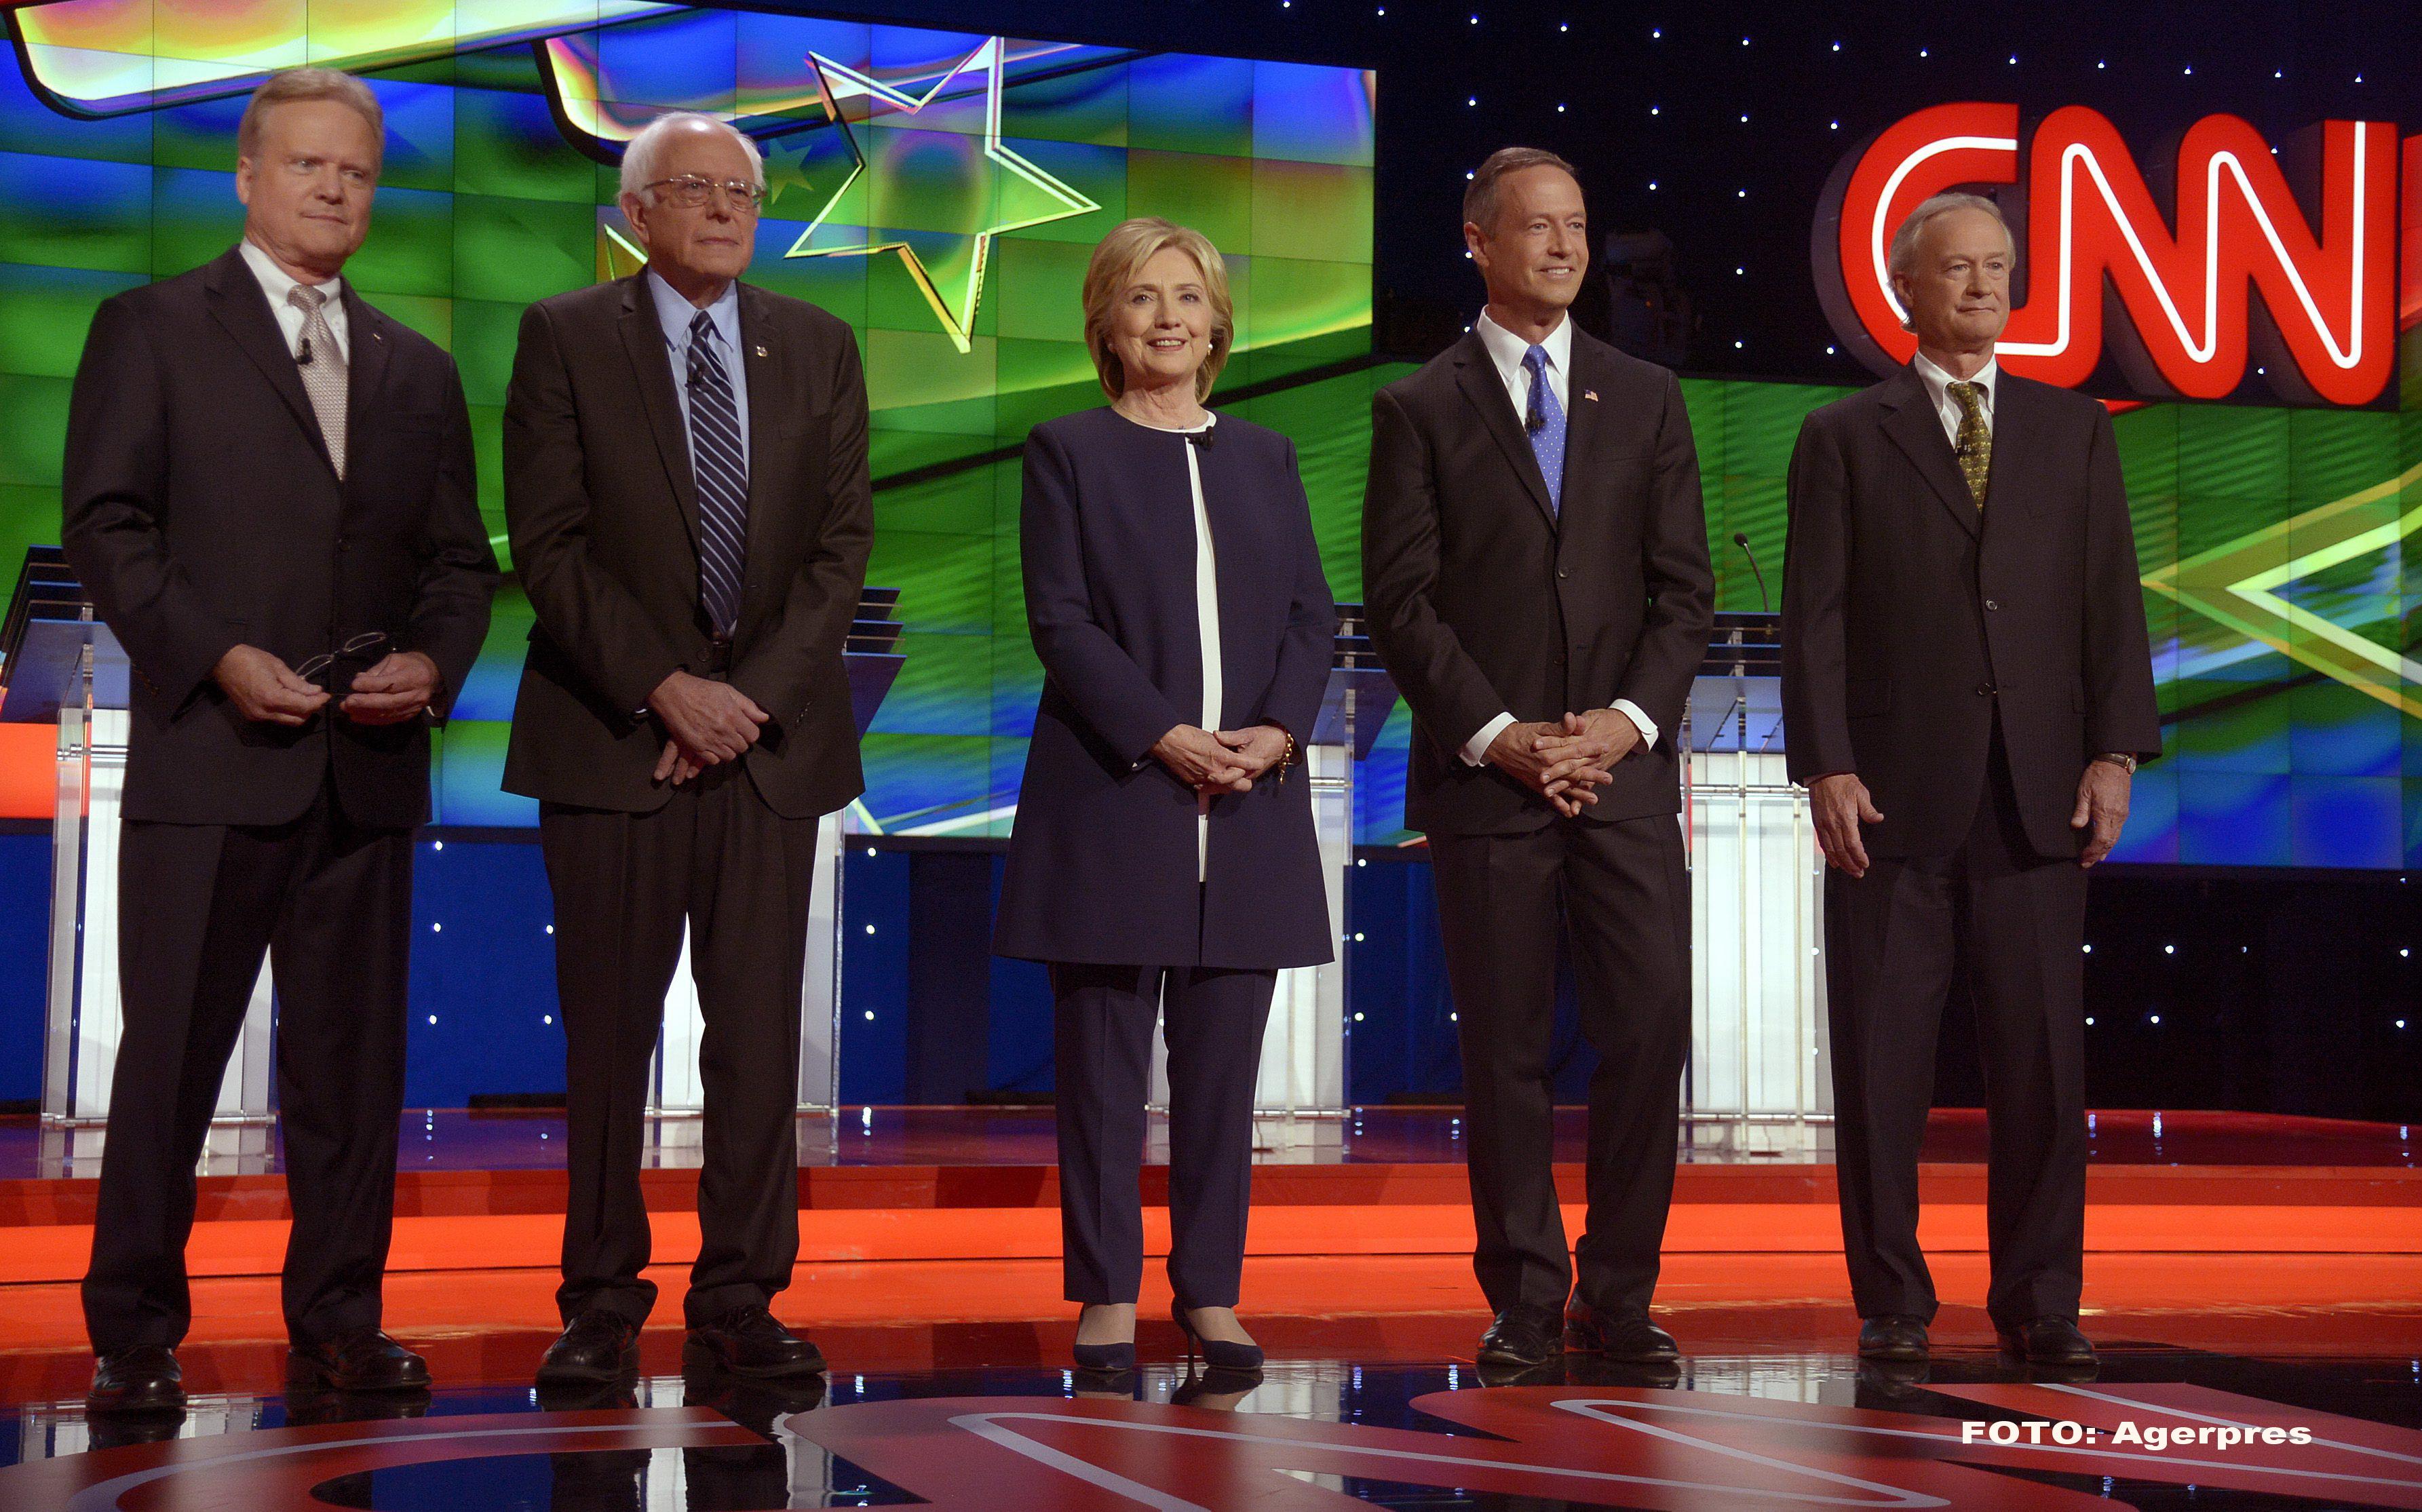 Alegeri prezidentiale in SUA 2016. Hillary Clinton a primit un ajutor neasteptat in prima dezbatere a candidatilor democrati